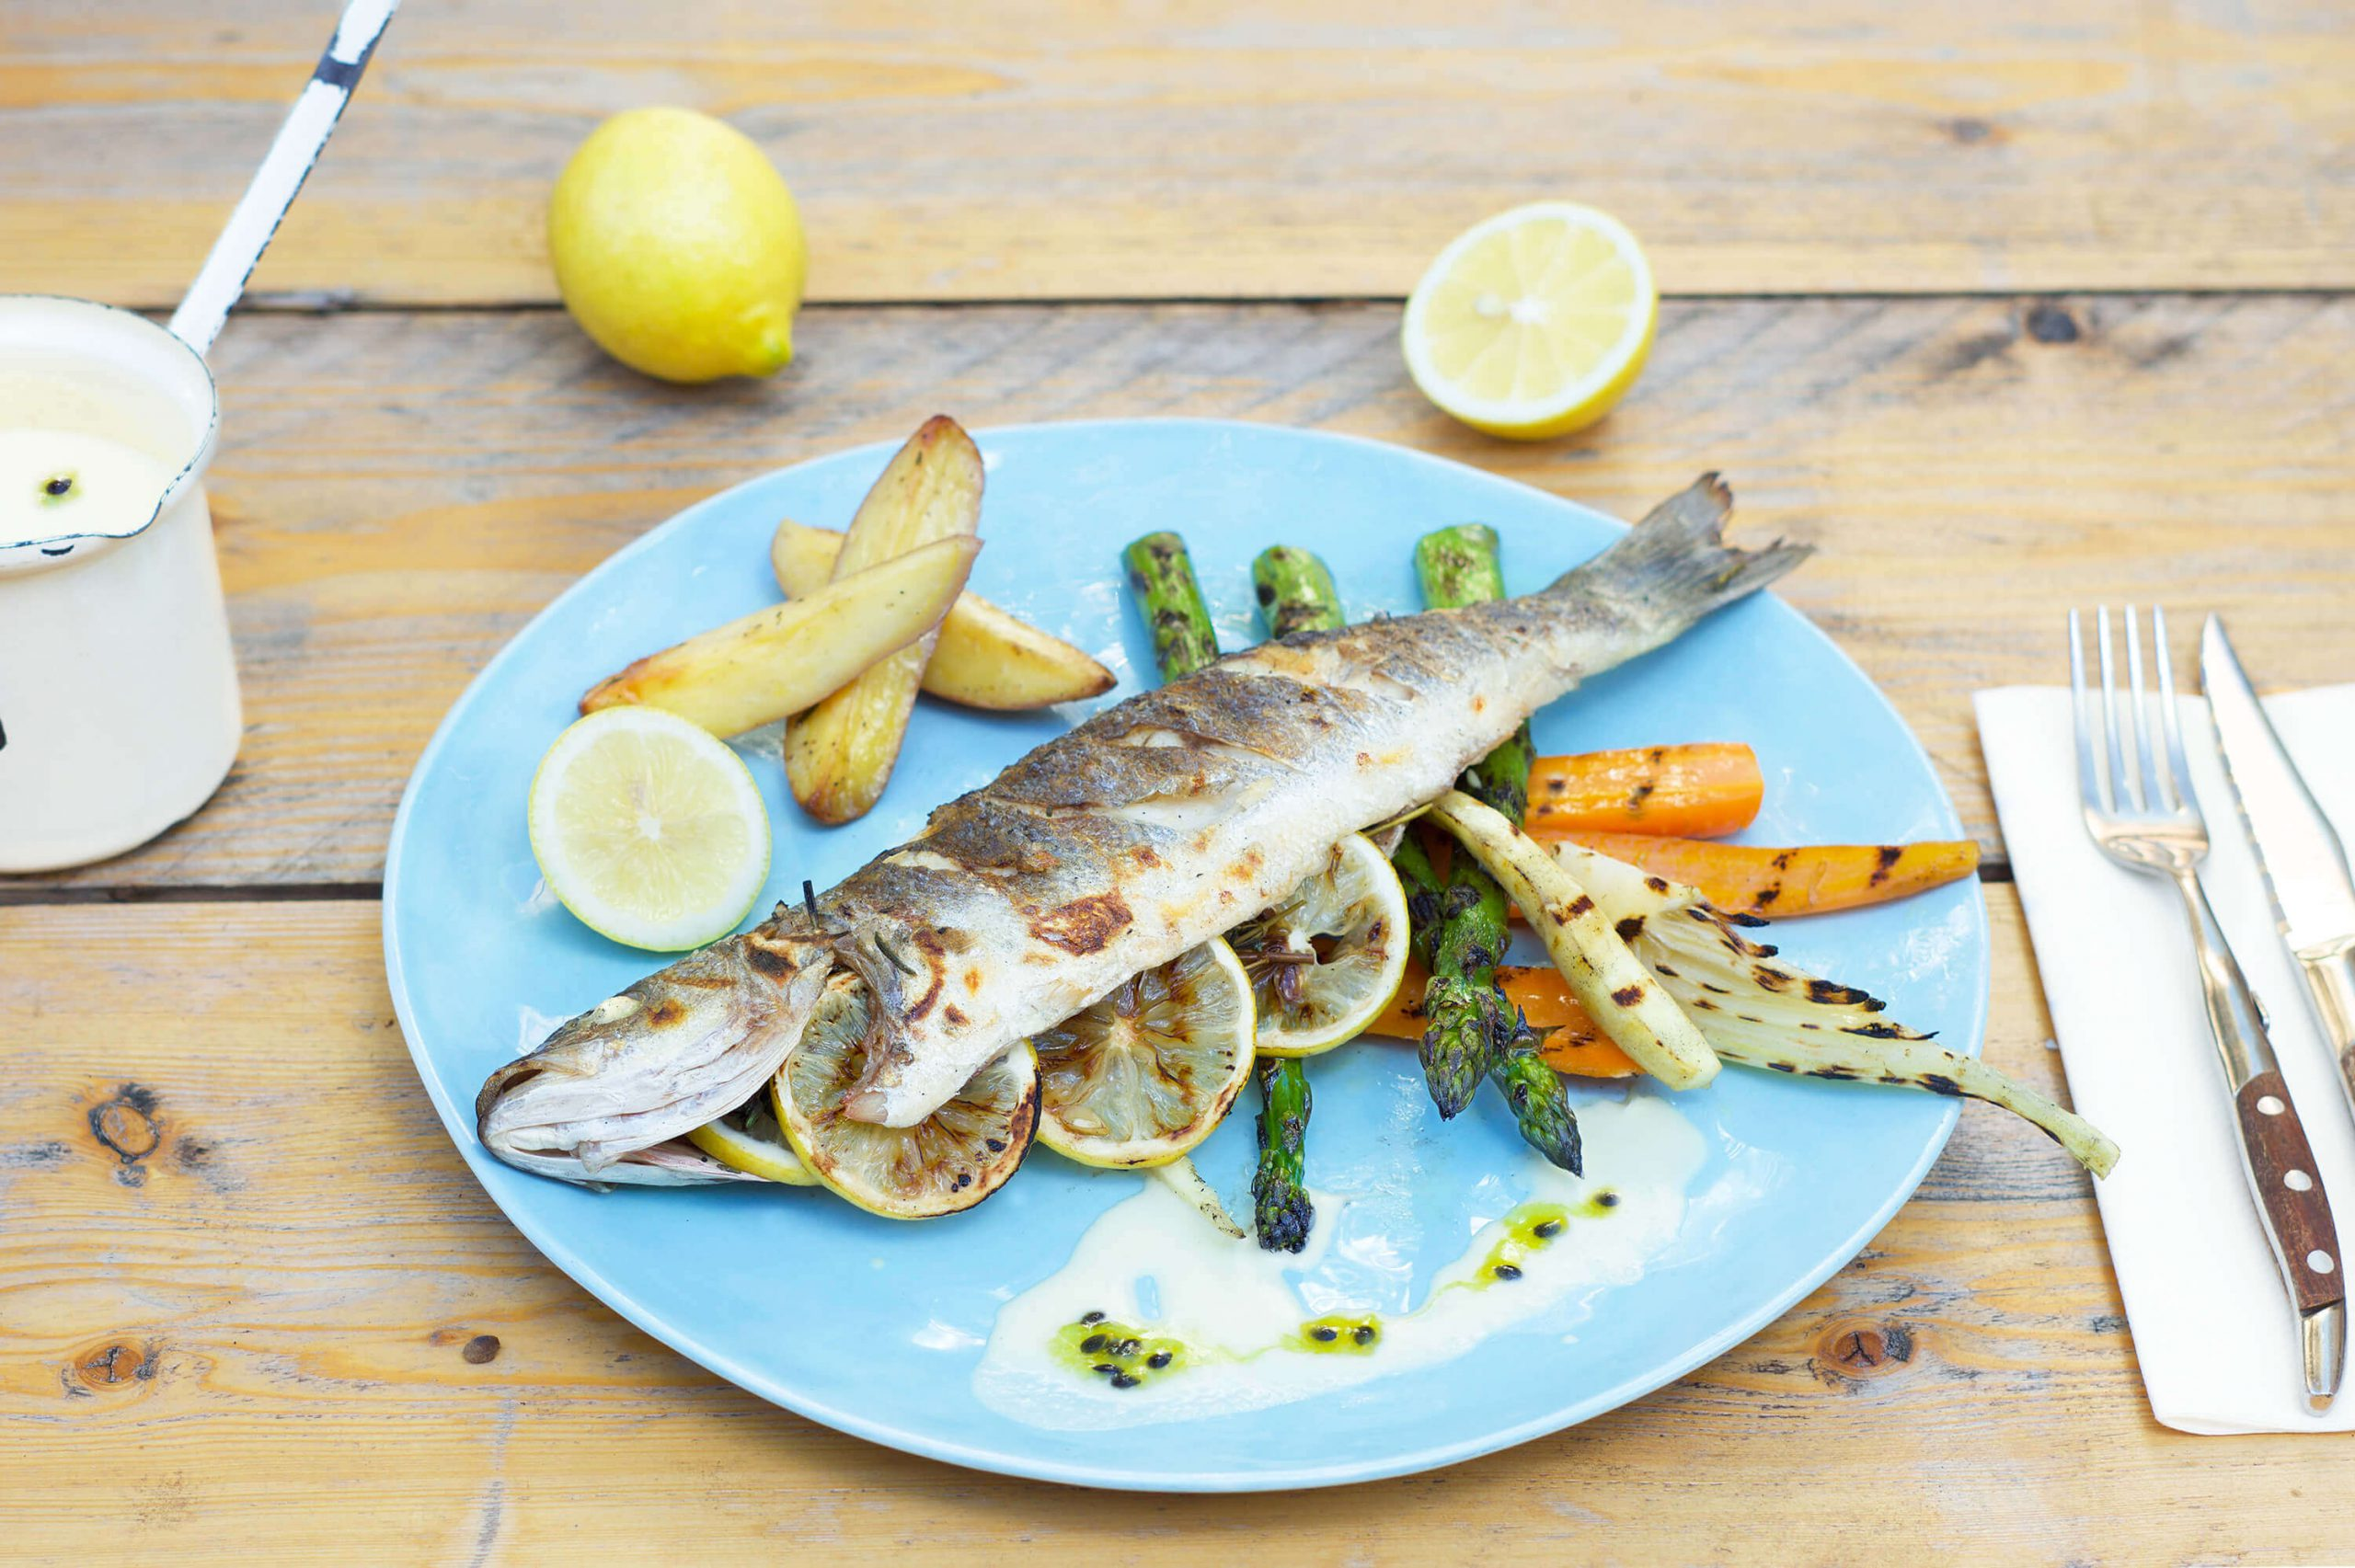 The Lemon Kitchen recept bij Restaurant M'eat Den Bosch